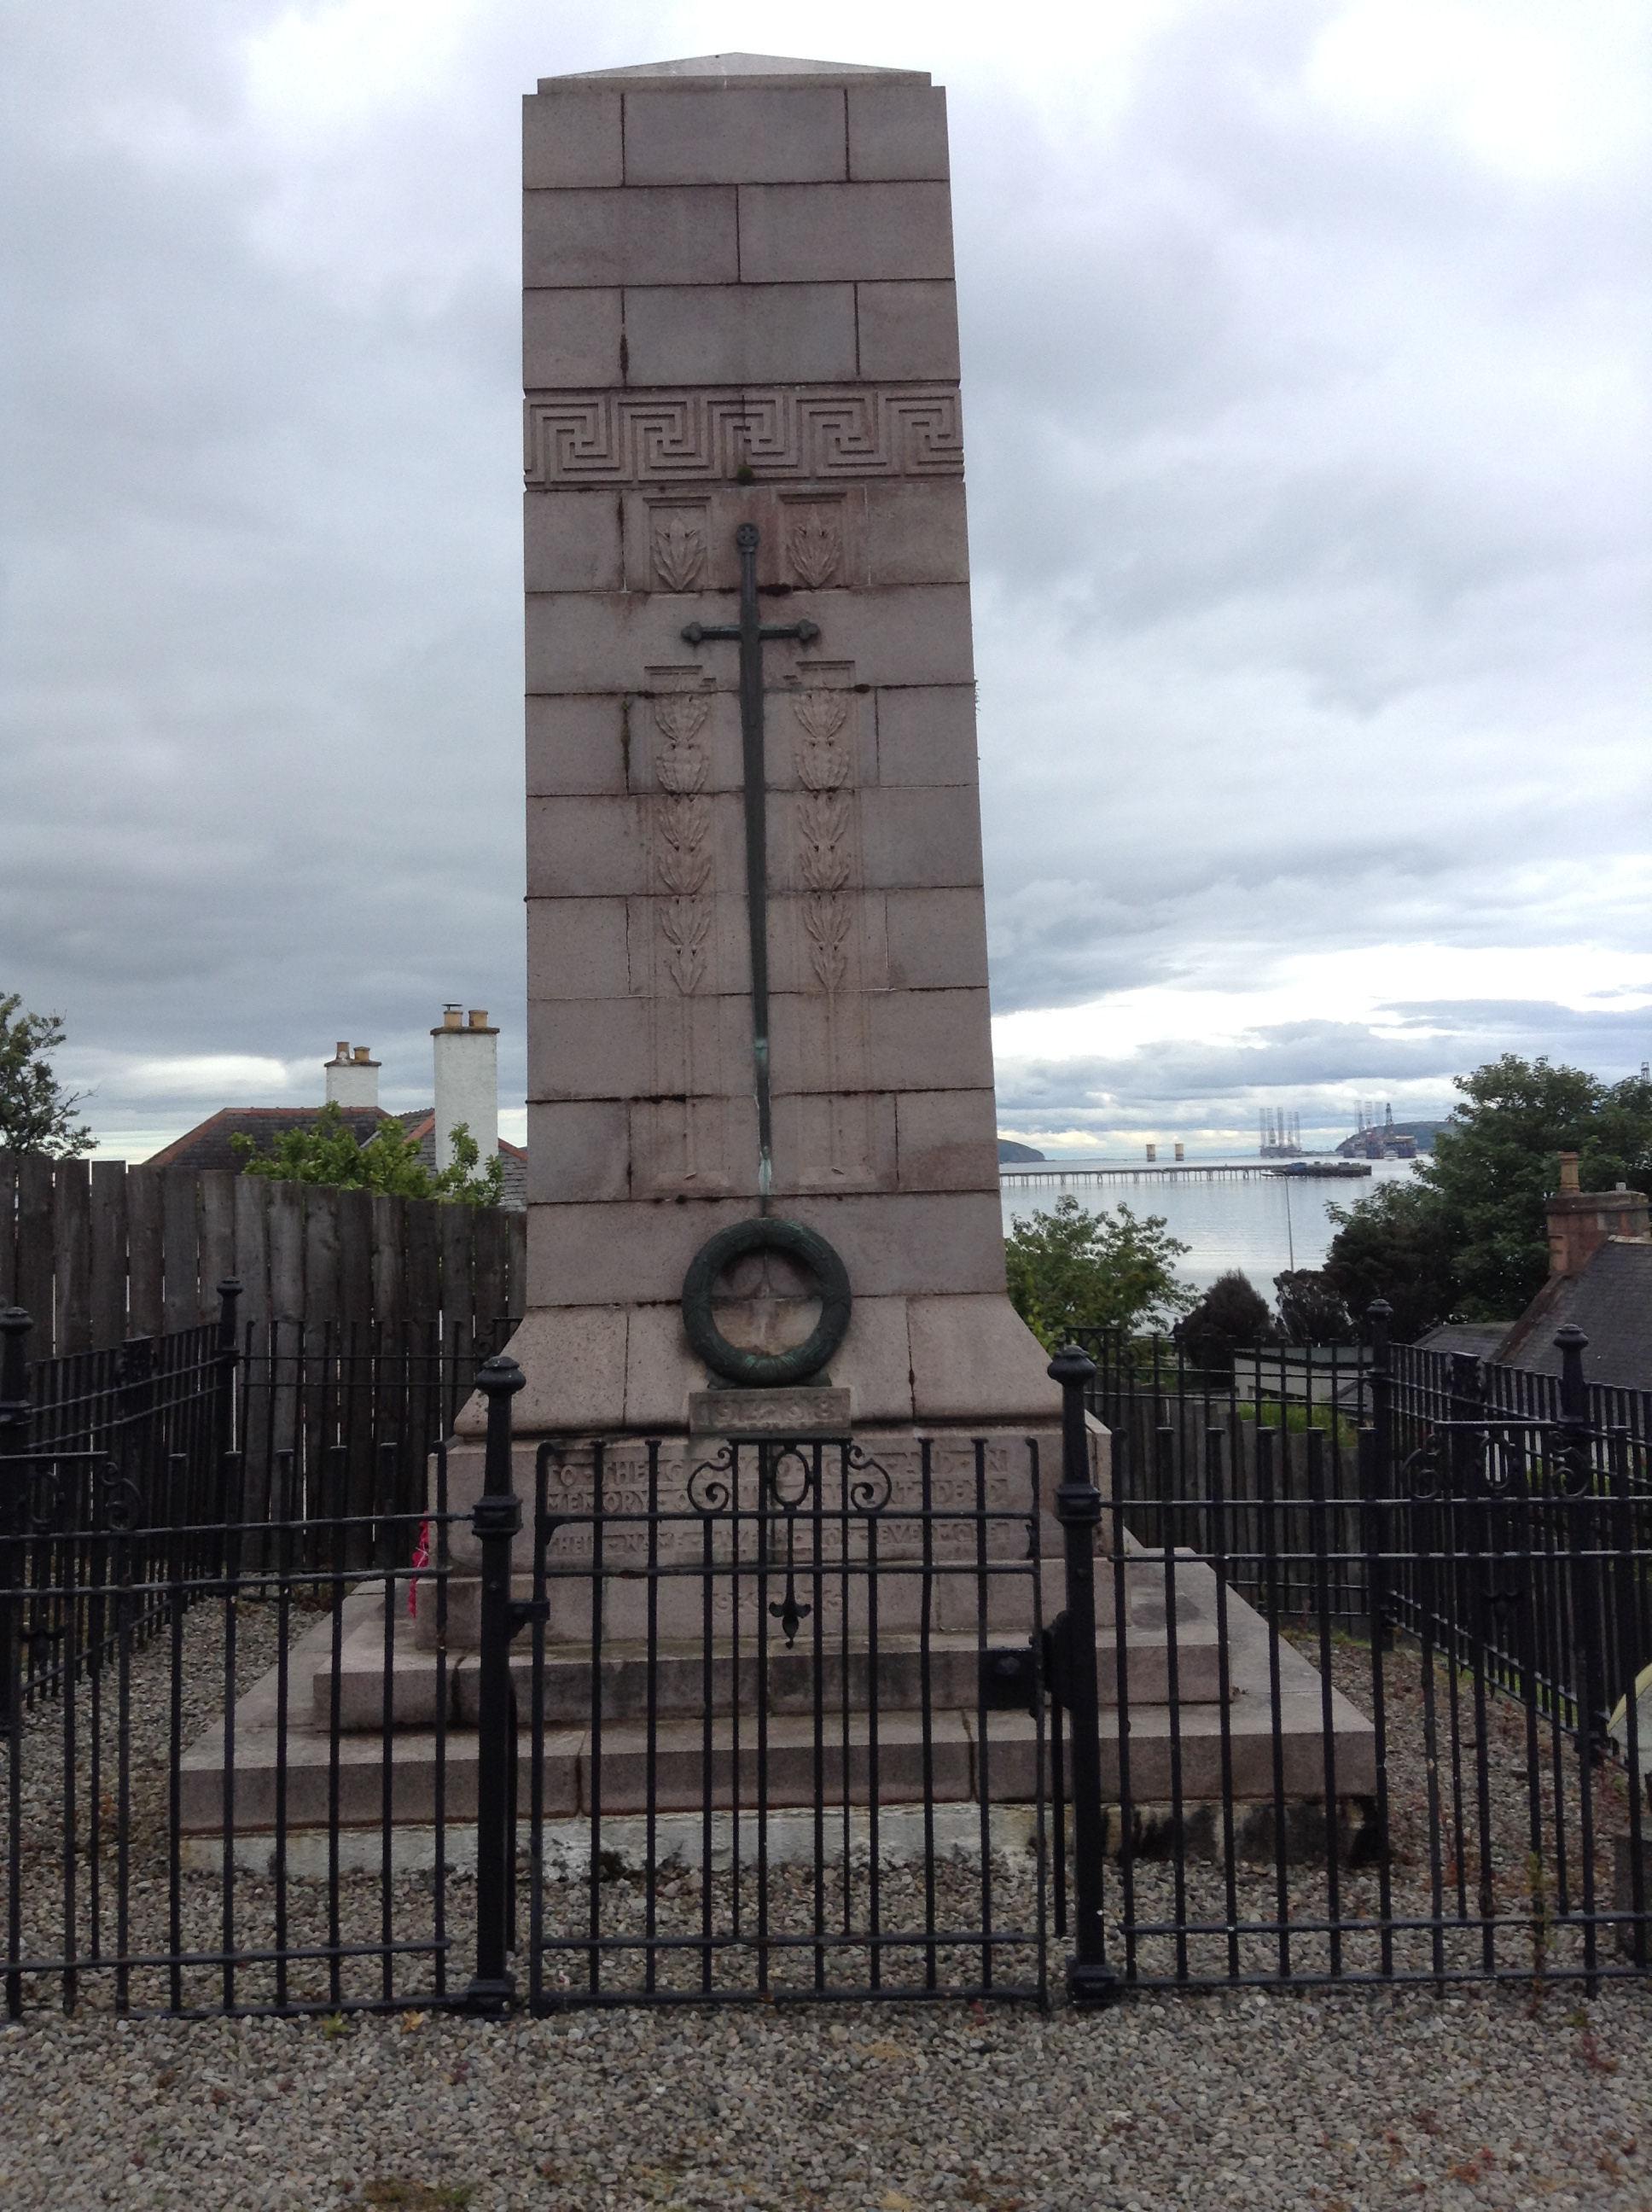 War Memorial– The War Memorial in Invergordon, Scotland, displaying the name believed to be Harry Dundas McGlashan (MacGlashan). Image taken 6 July 2017 by Tom Tulloch.